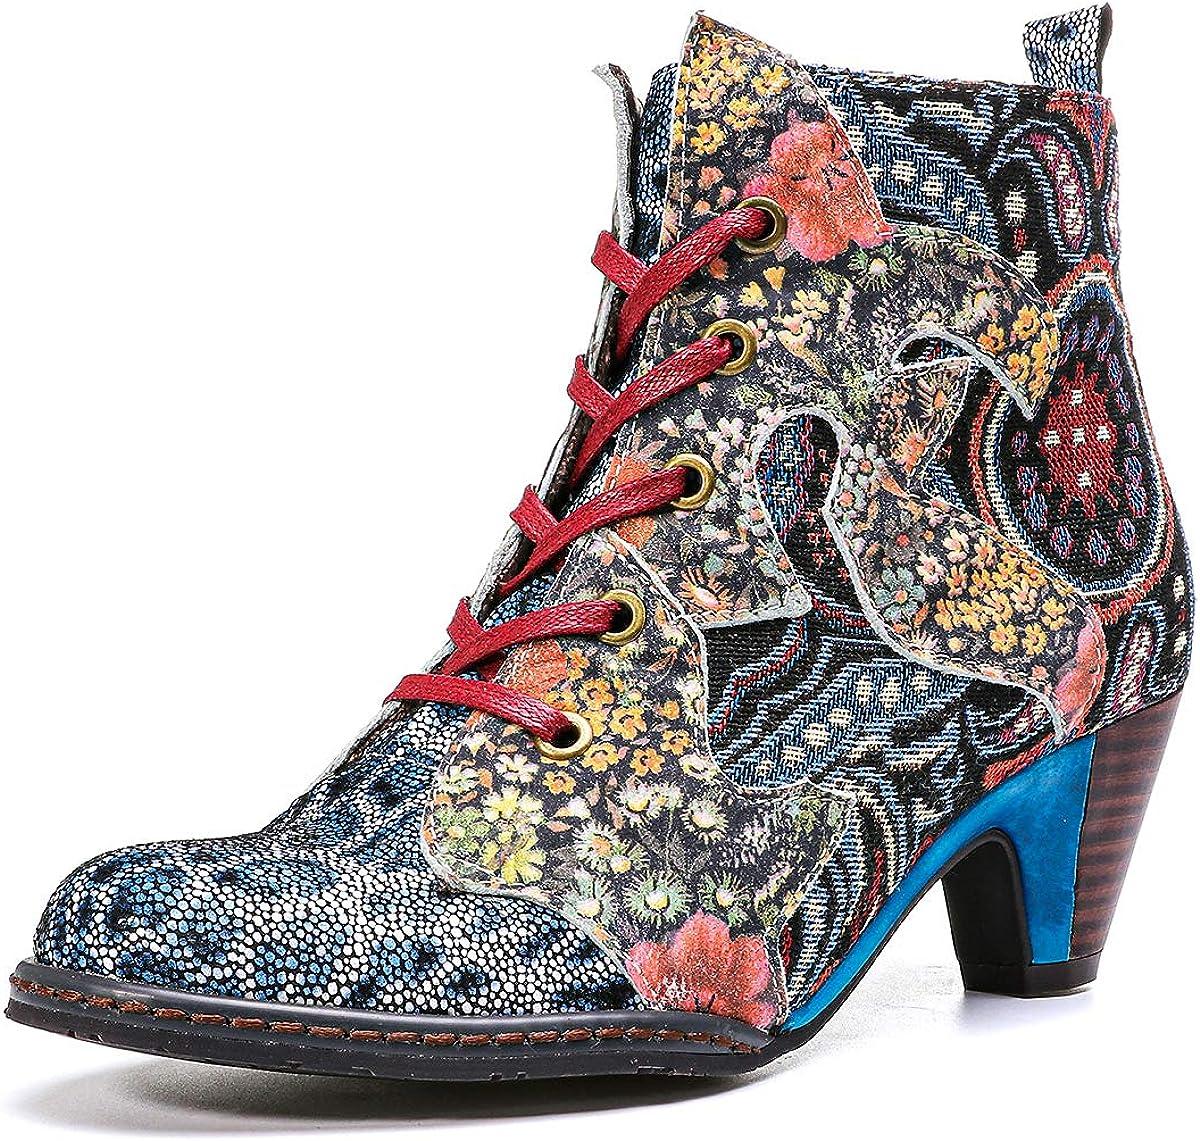 gracosy Women's Ankle Learther Booties, Block Heel Boots Bohemian Splicing Pattern Pointed Toe Low Heel Side Zipper Boots